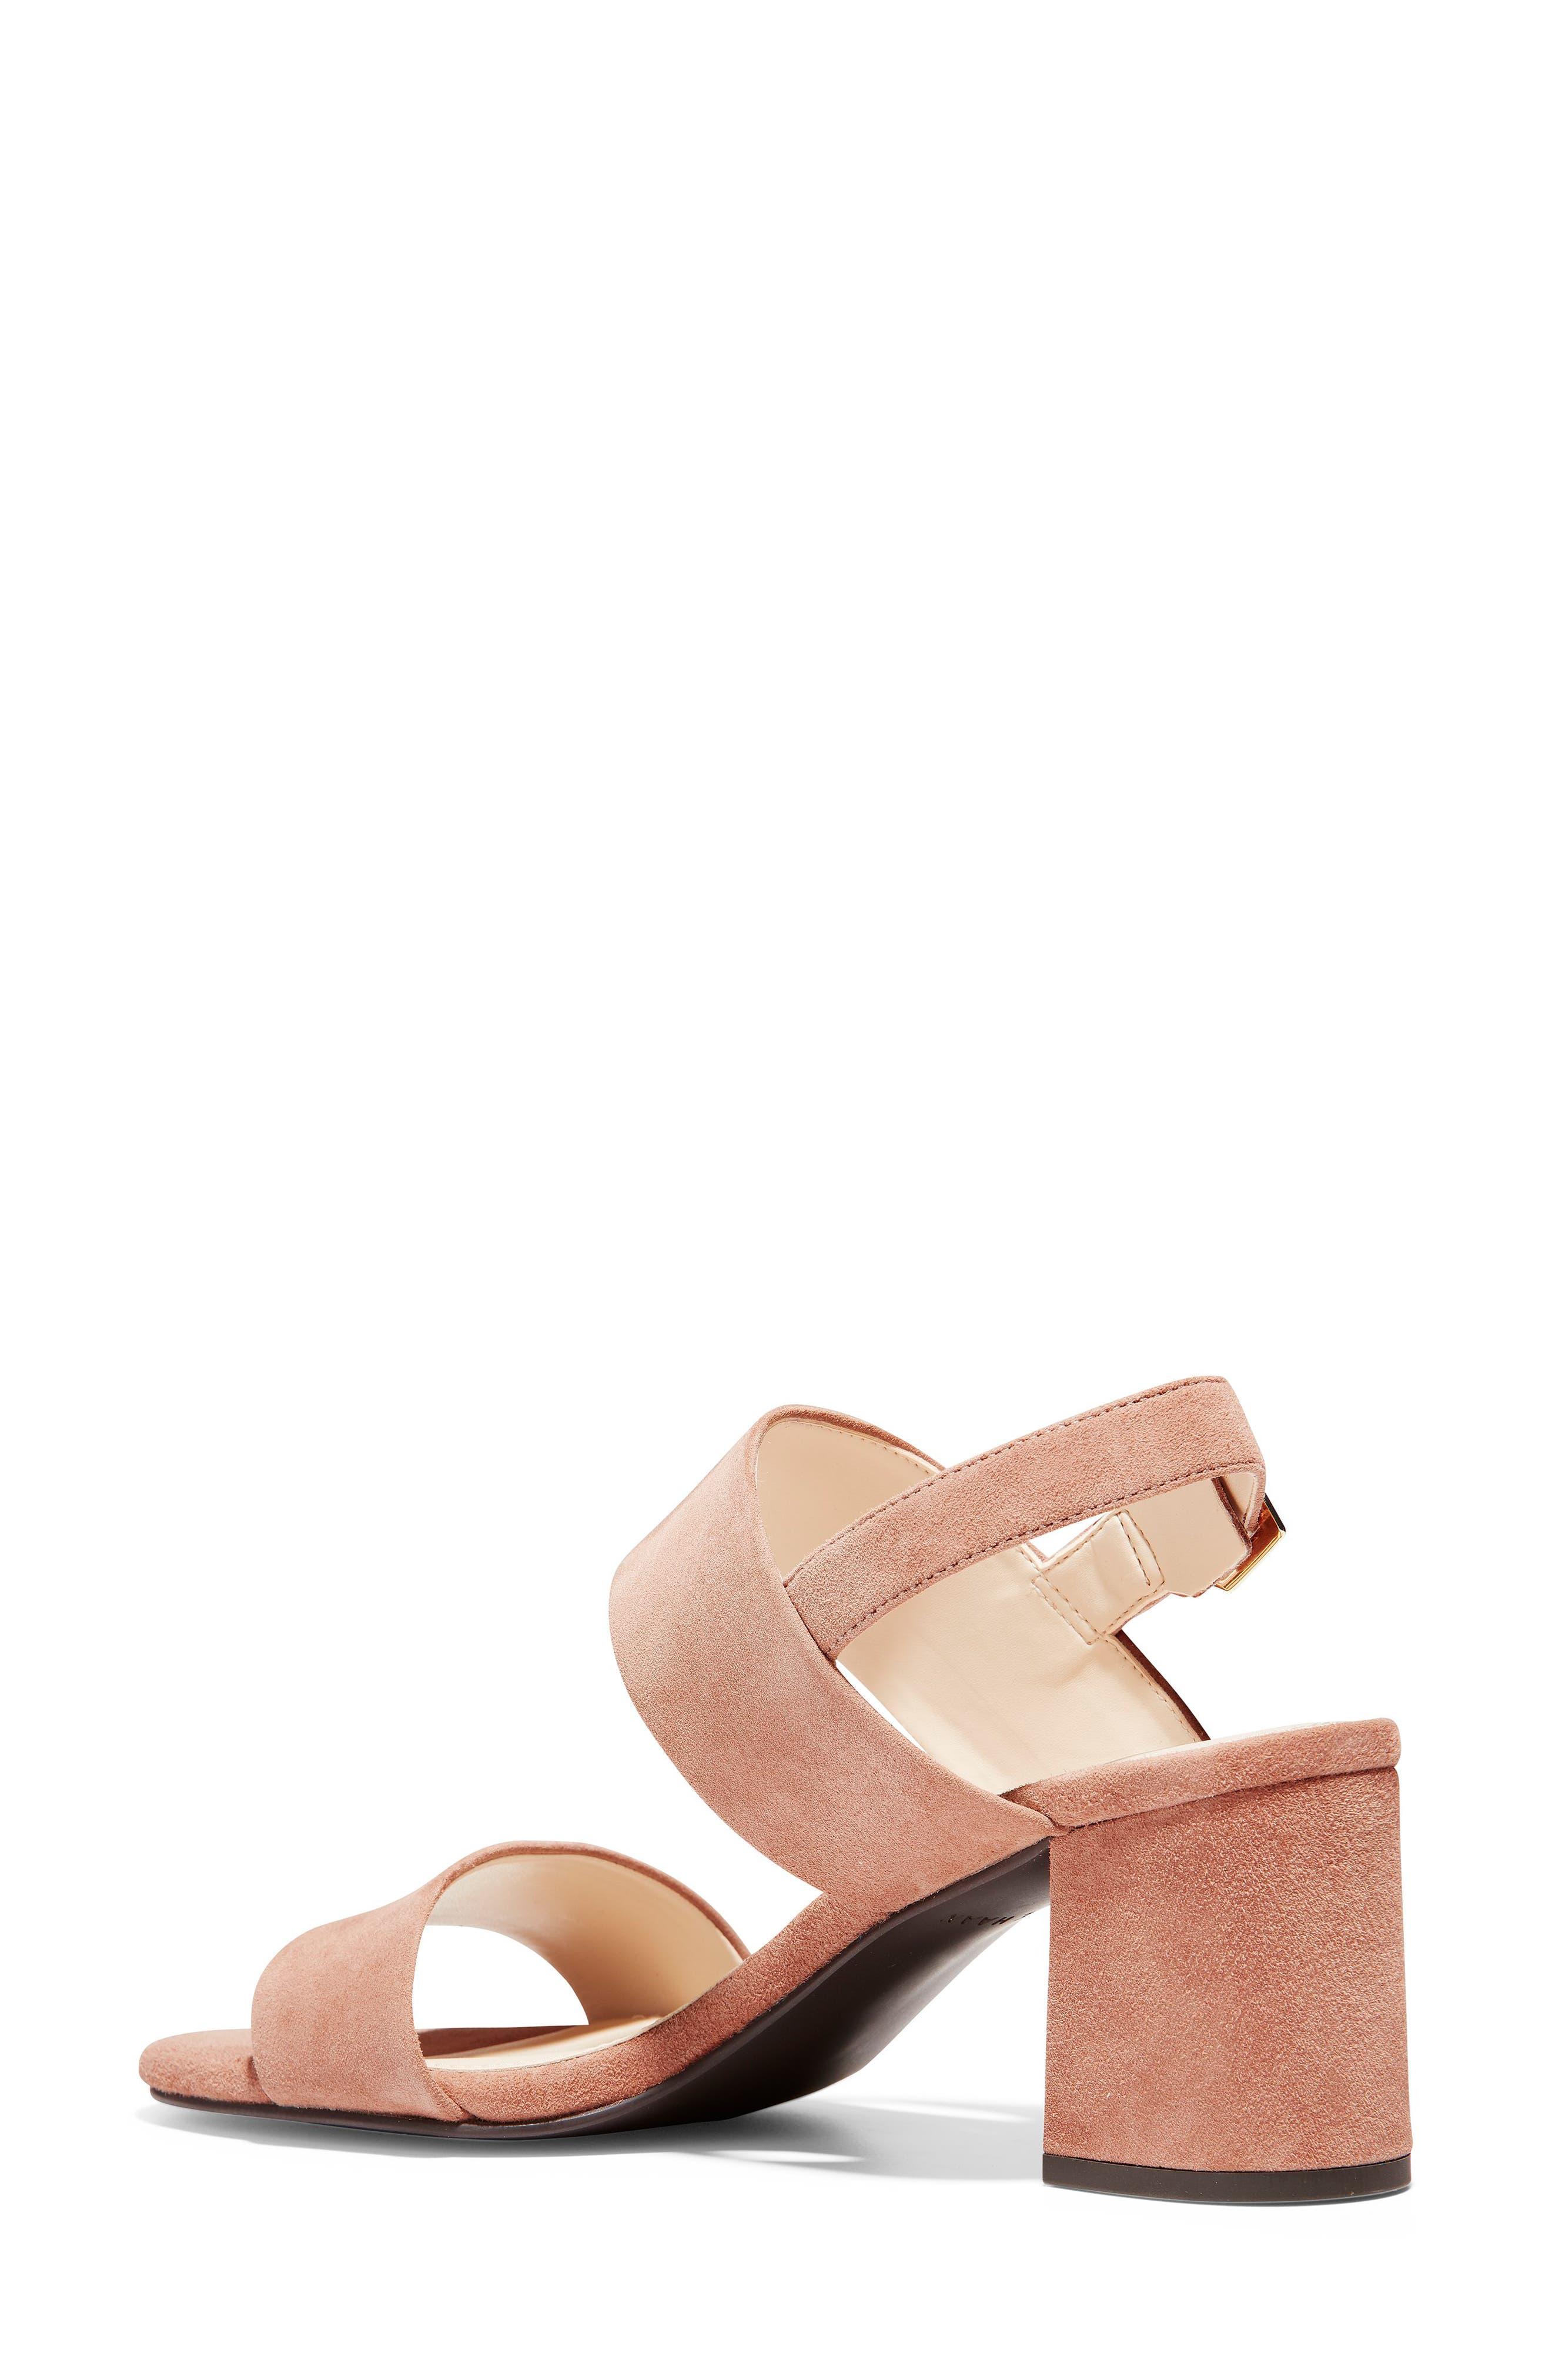 Avani Block Heel Sandal,                             Alternate thumbnail 2, color,                             MOCHA MOUSSE SUEDE